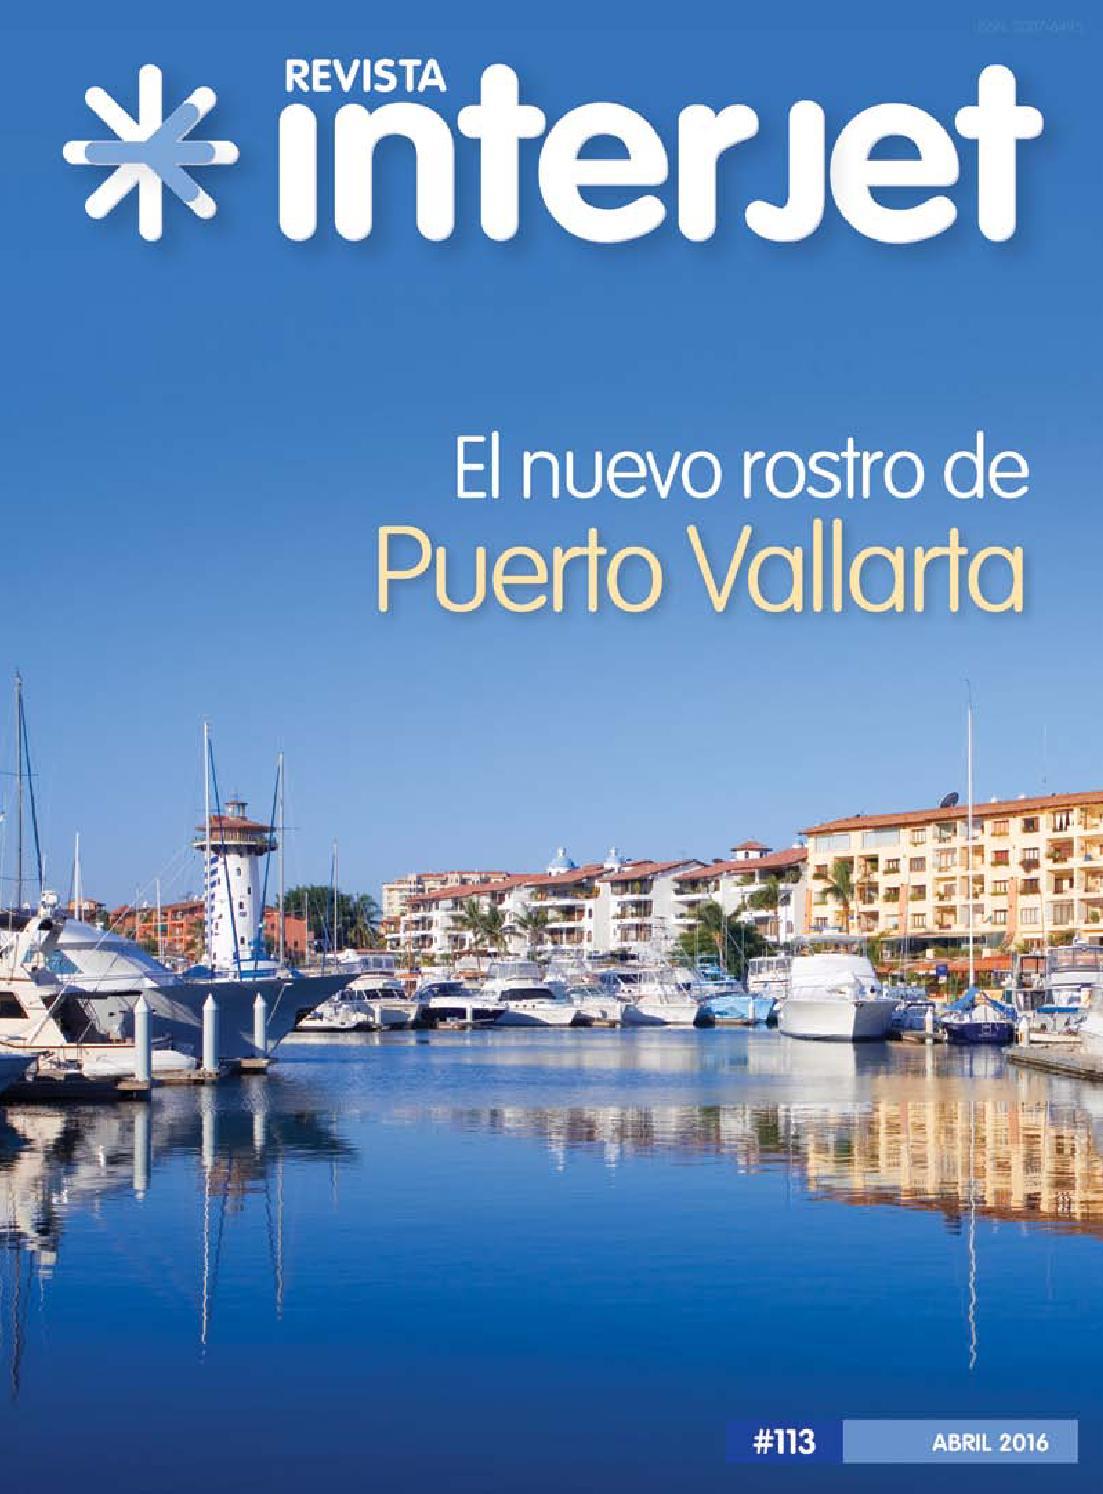 Revista interjet abril 2016 by interjet issuu for Oficinas de interjet